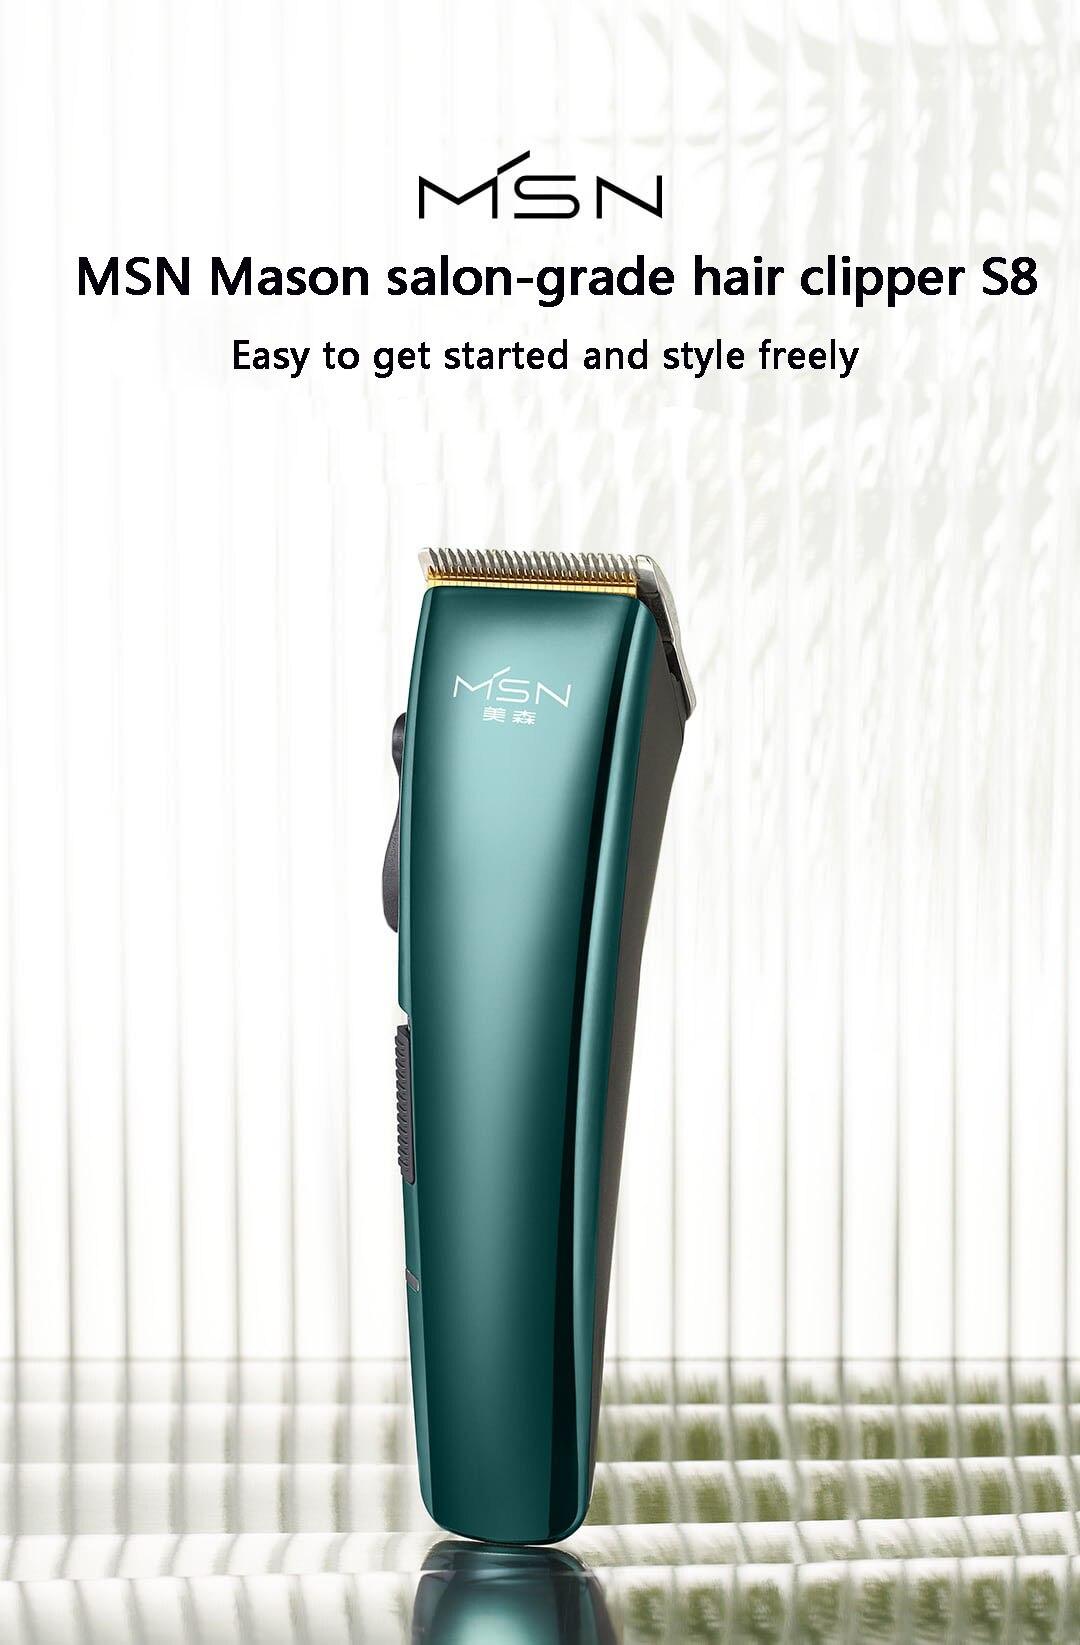 ماشین اصلاح موی شیائومی MSN S8